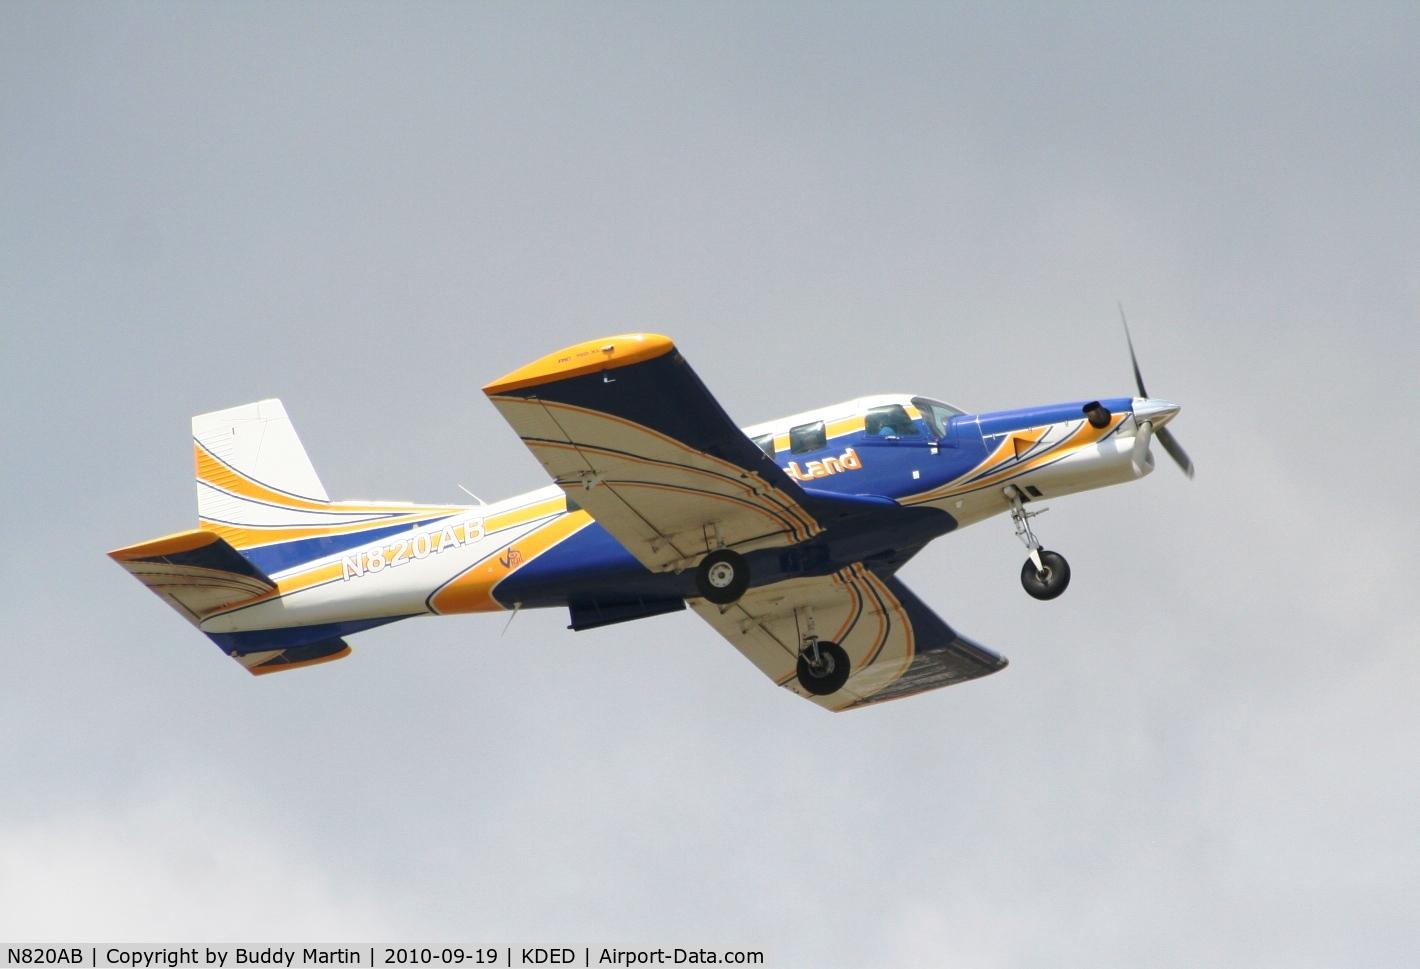 N820AB, 2005 Pacific Aerospace 750XL C/N 116, Takeoff Runway 5 at KDED